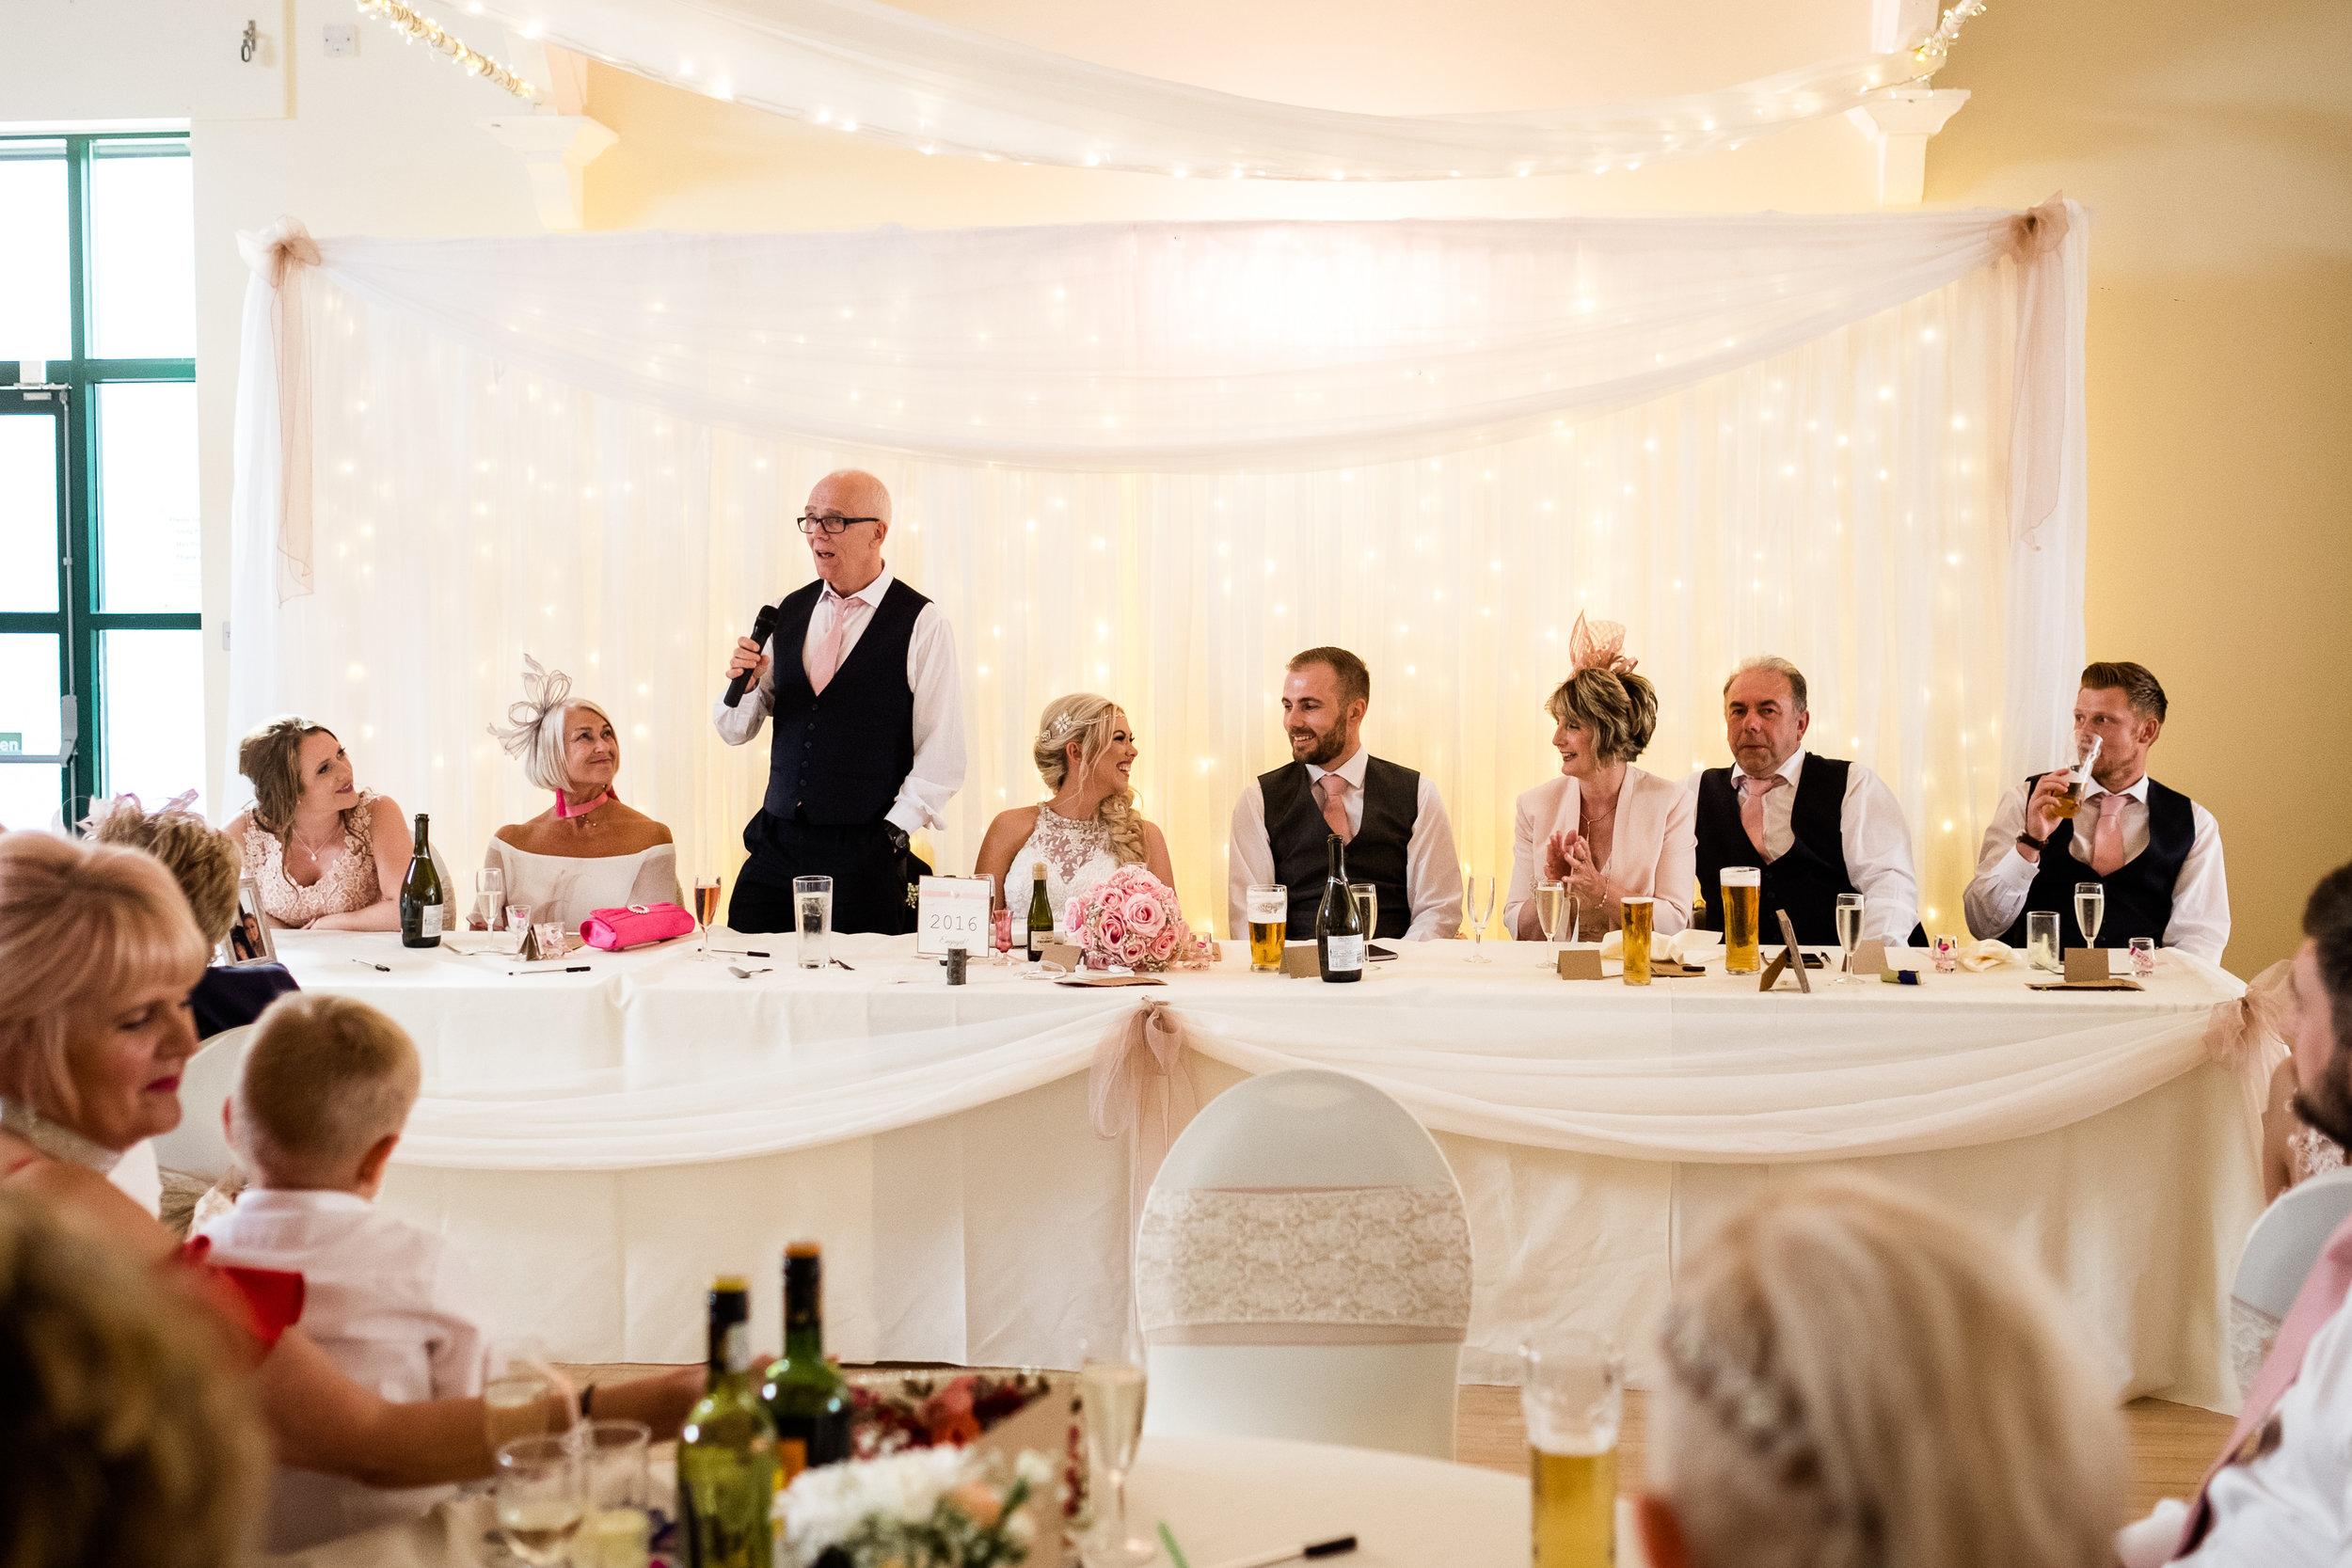 Summer Documentary Wedding Photography Floral Hall, Stoke-on-Trent, Staffordshire - Jenny Harper-43.jpg